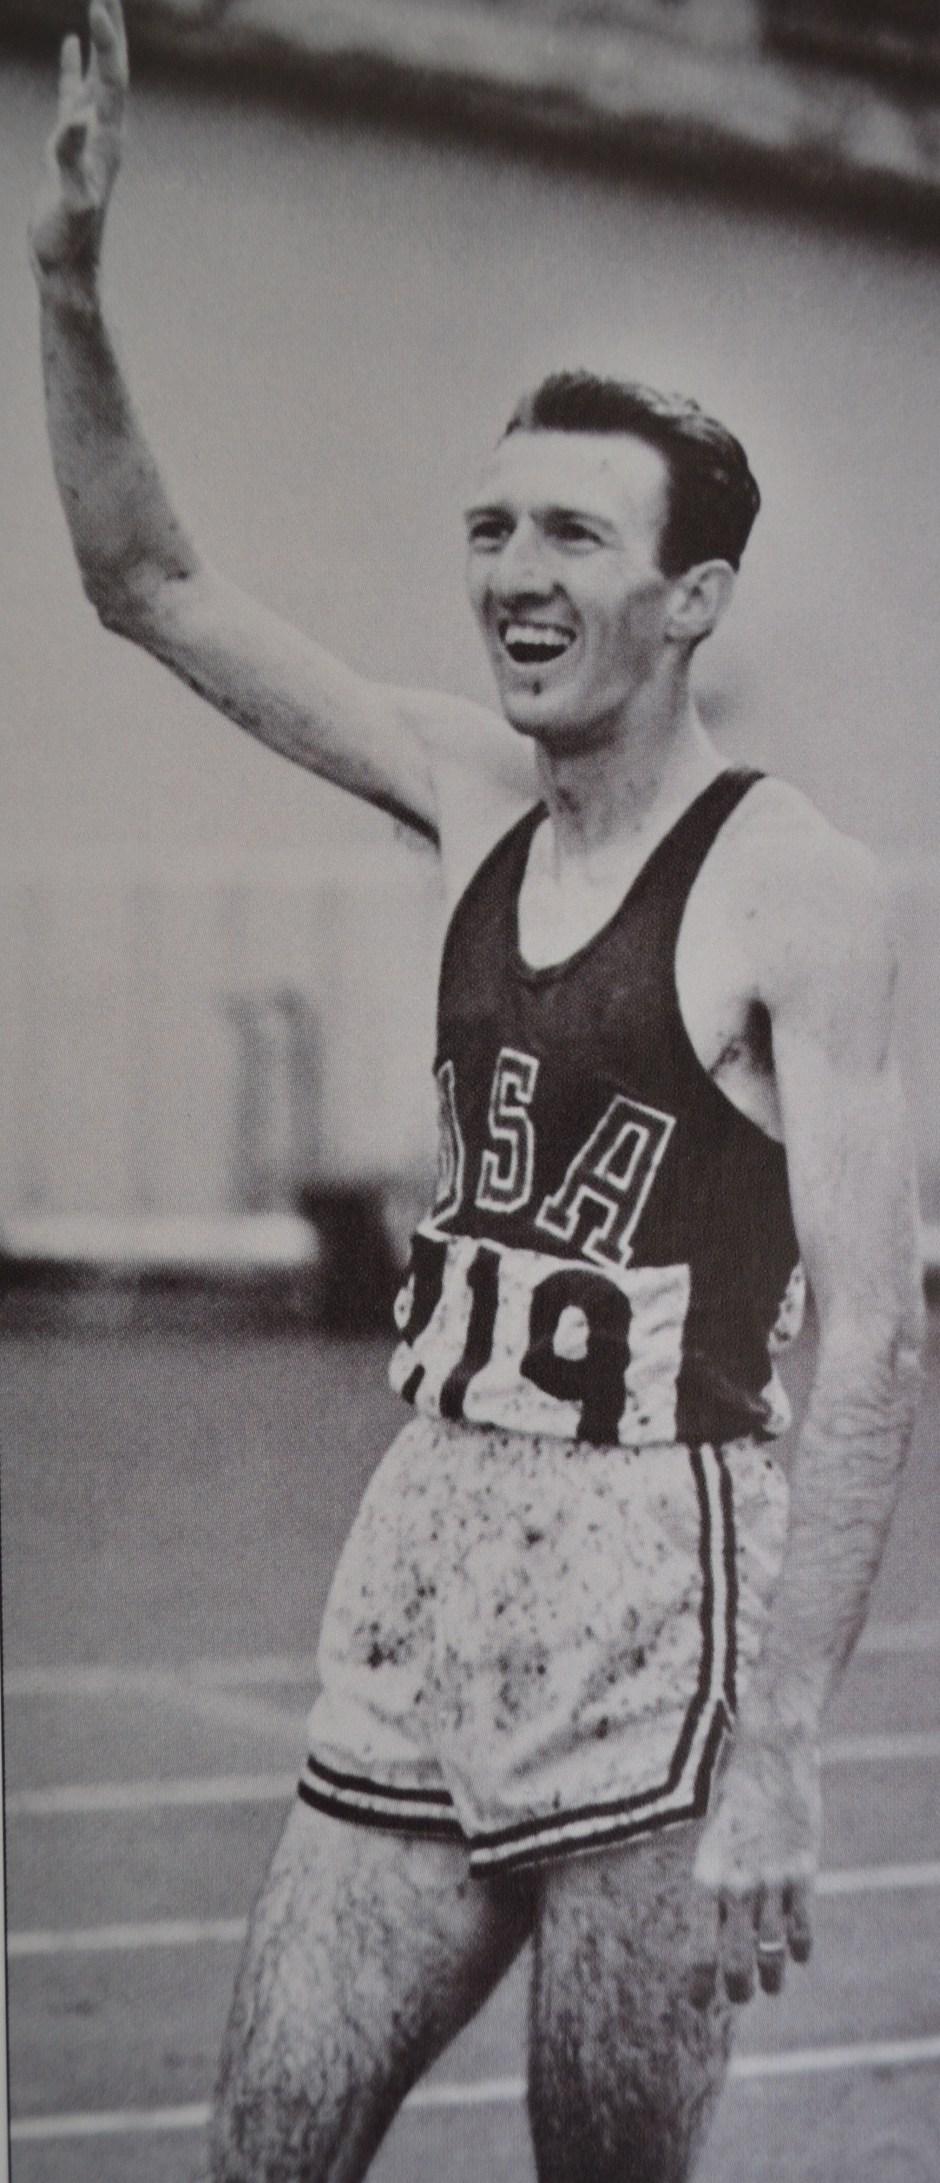 bob-schul-victorious_the-olympic-century-xviii-olympiad-volume-16